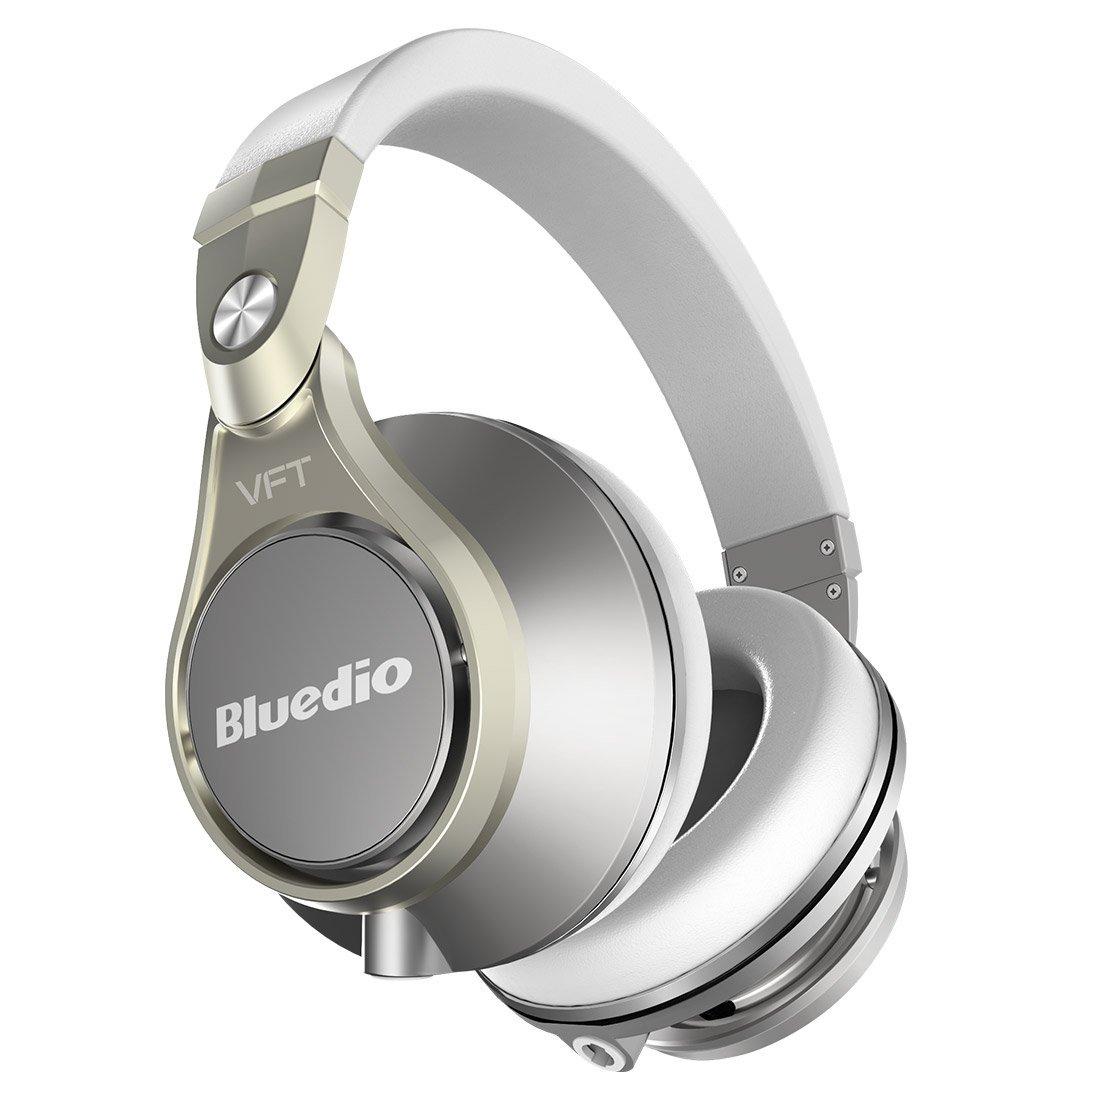 Bluedio U Plus (UFO) Pro auriculares inalámbricos bluetooth por solo 119,99€